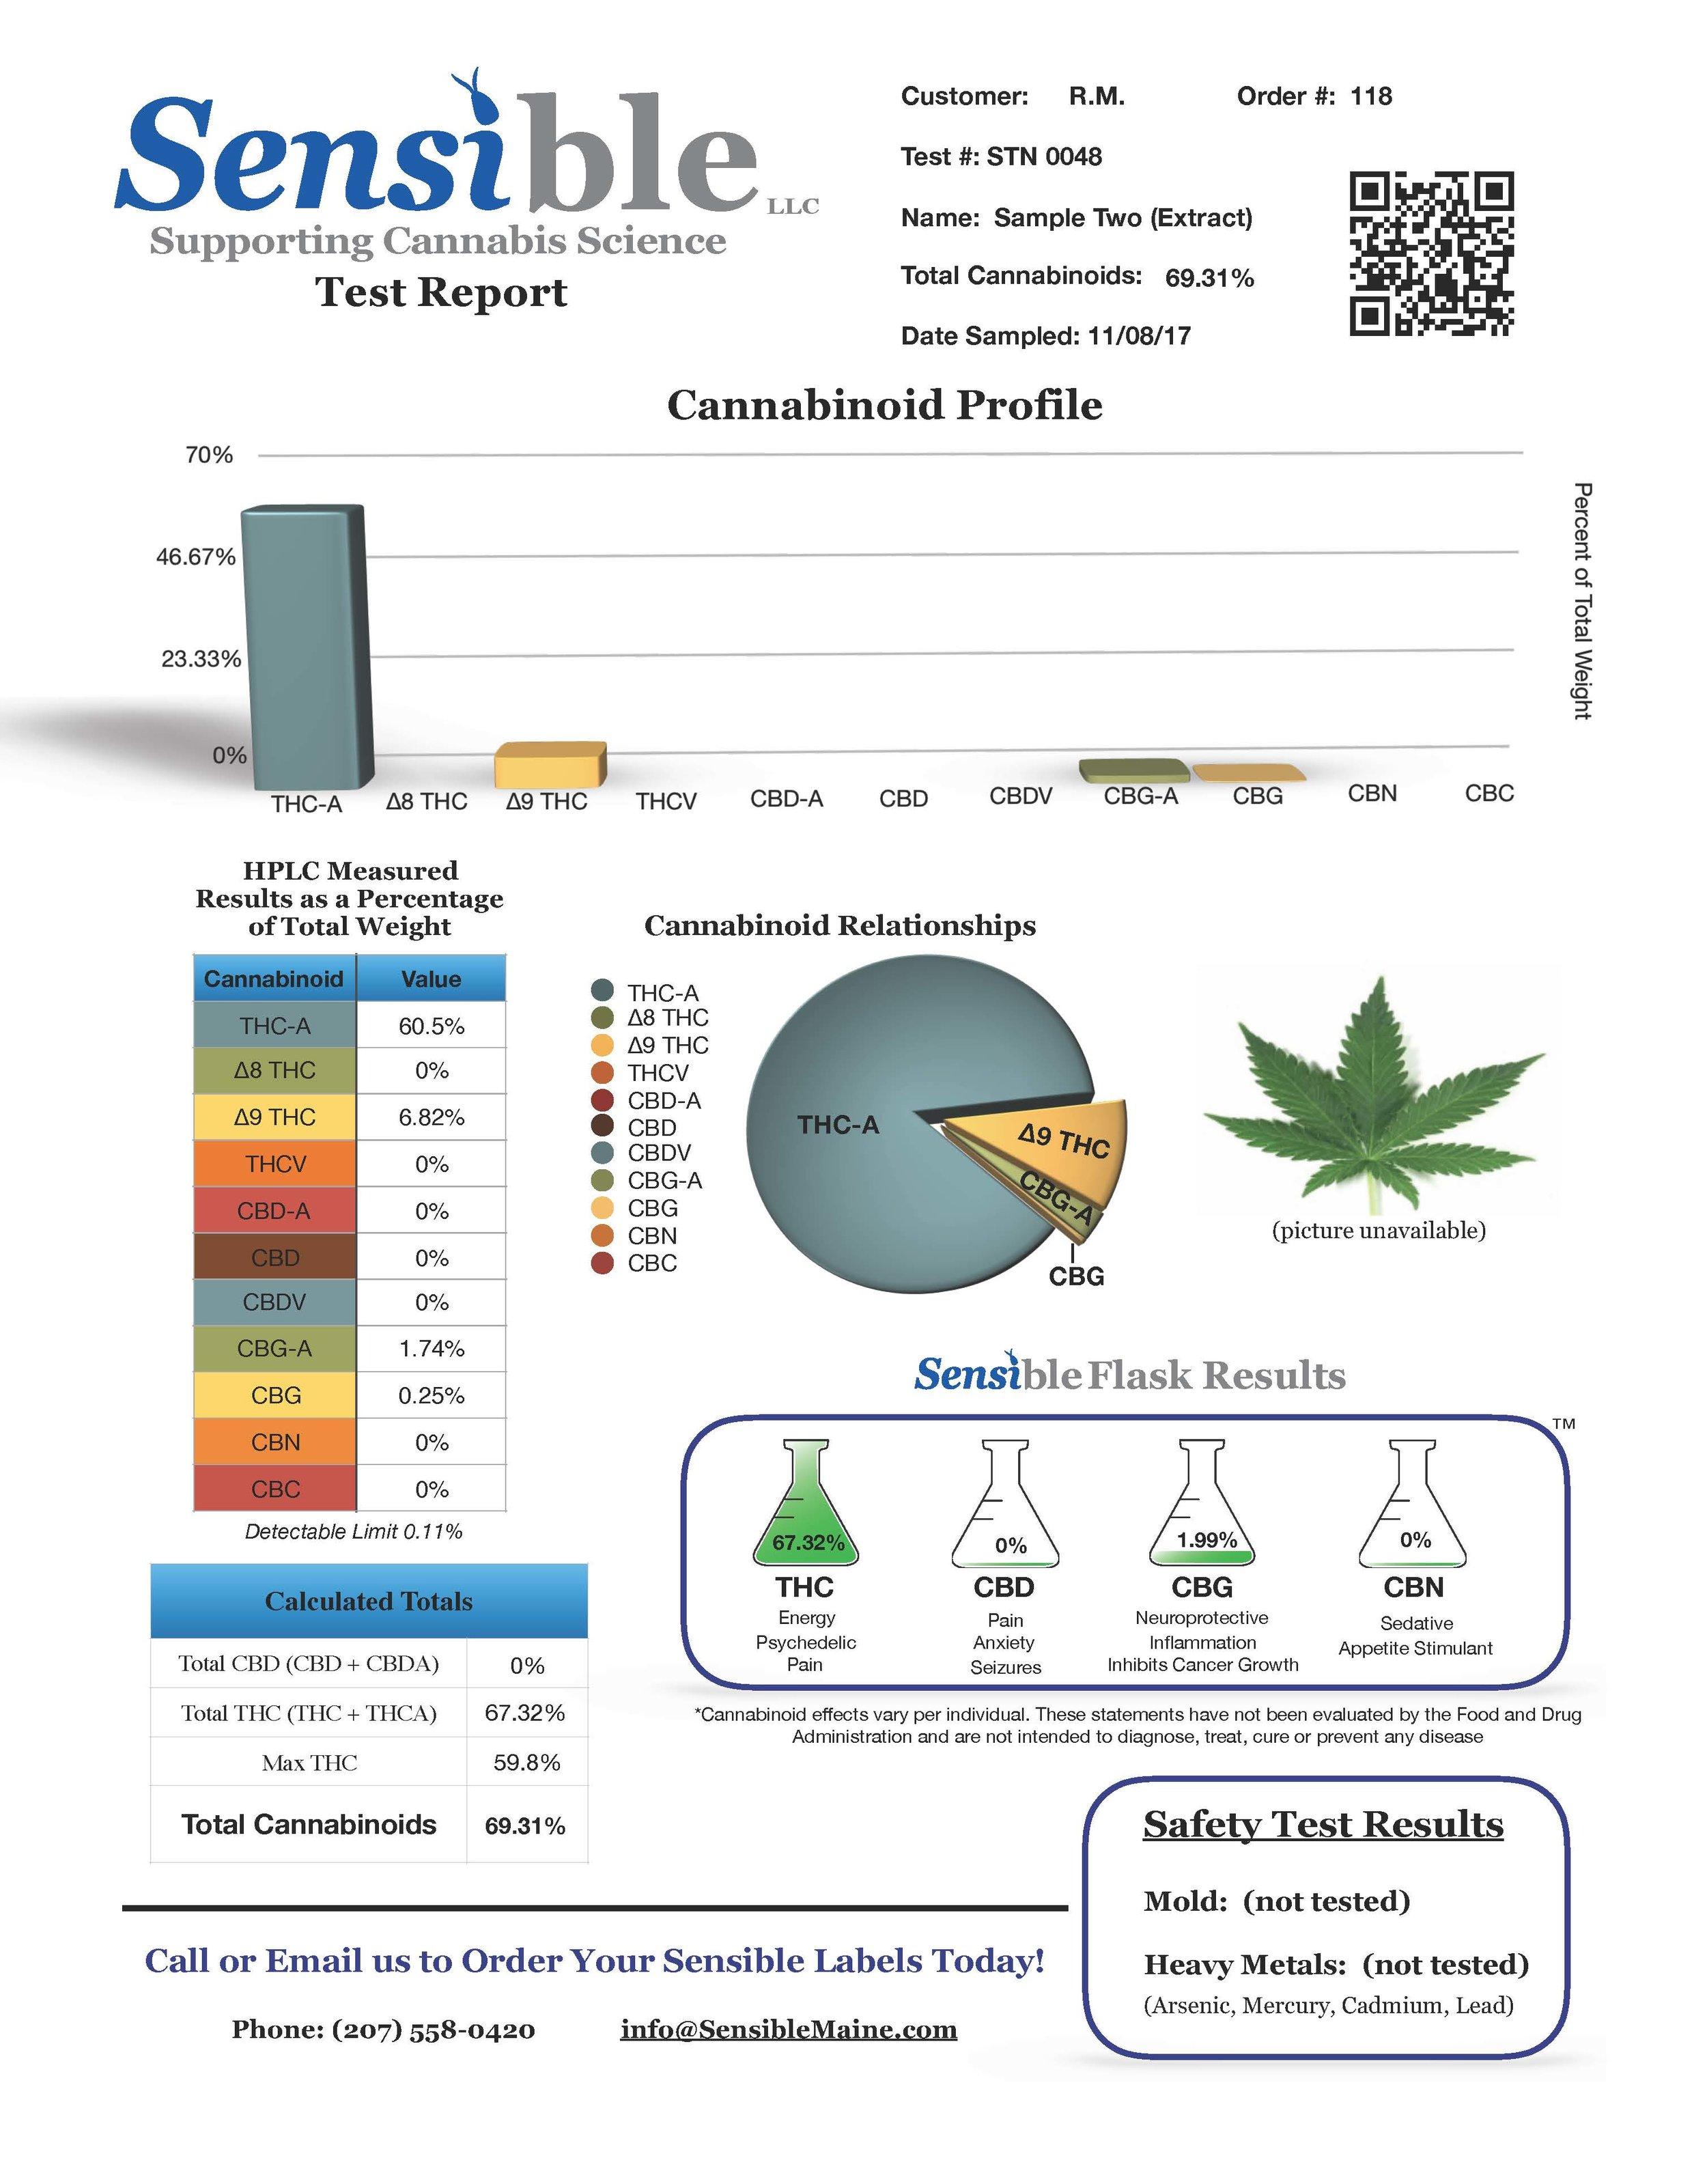 Test Report stn0048.jpg